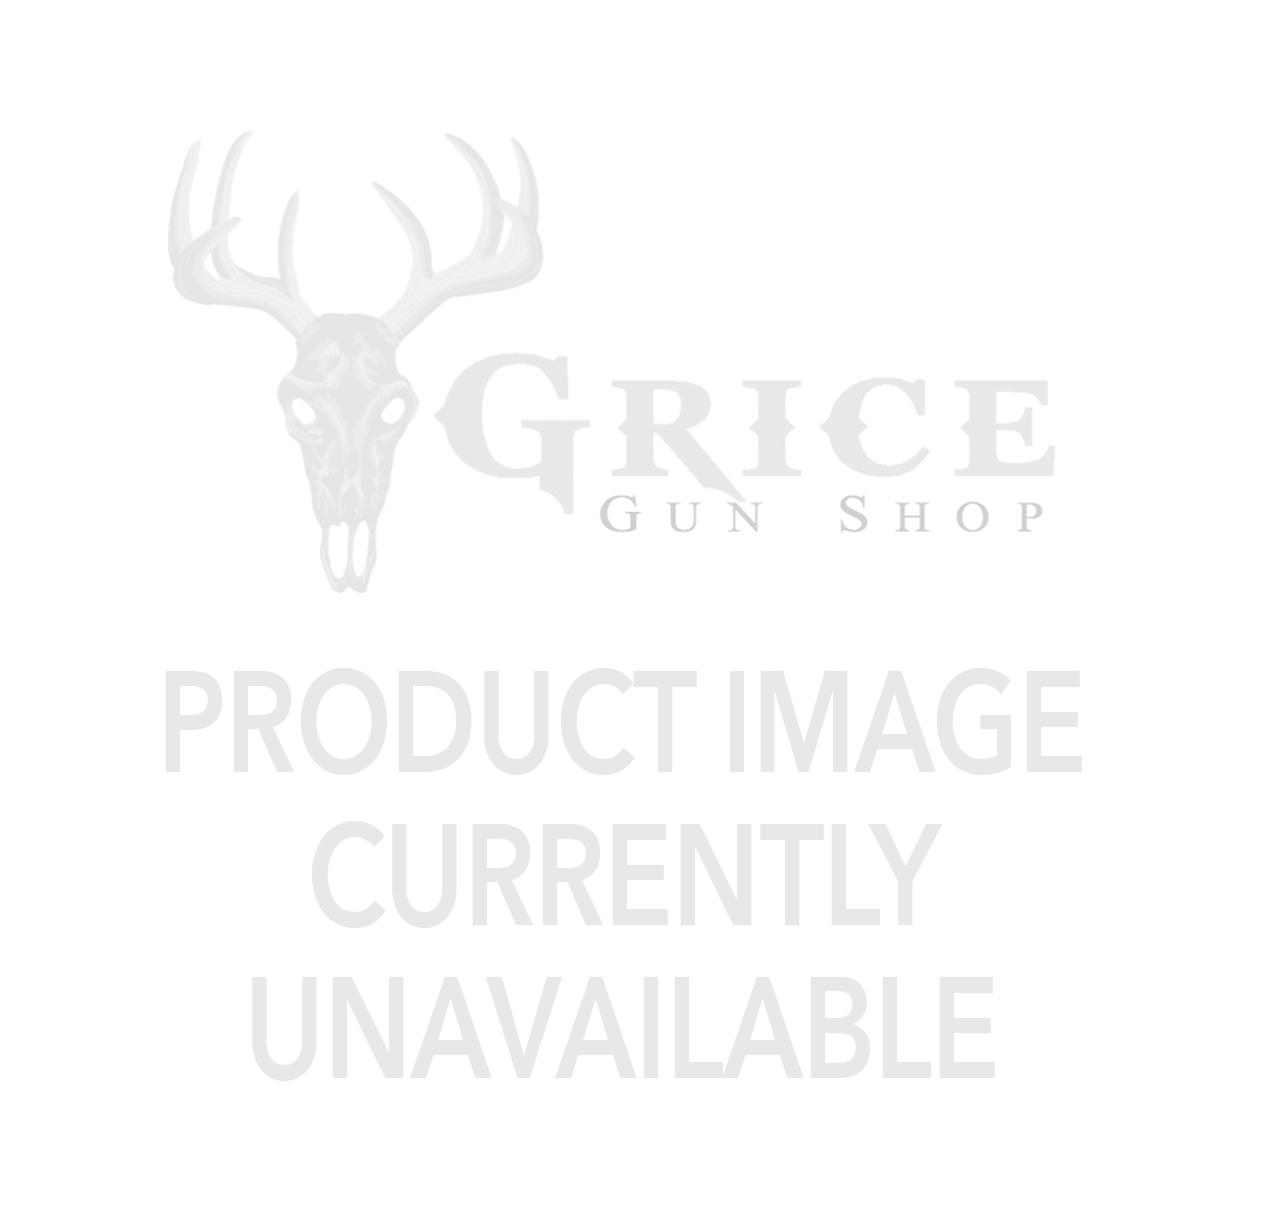 Hodgdon - N540 Vihta Vuori Smokeless Powder (1lb)